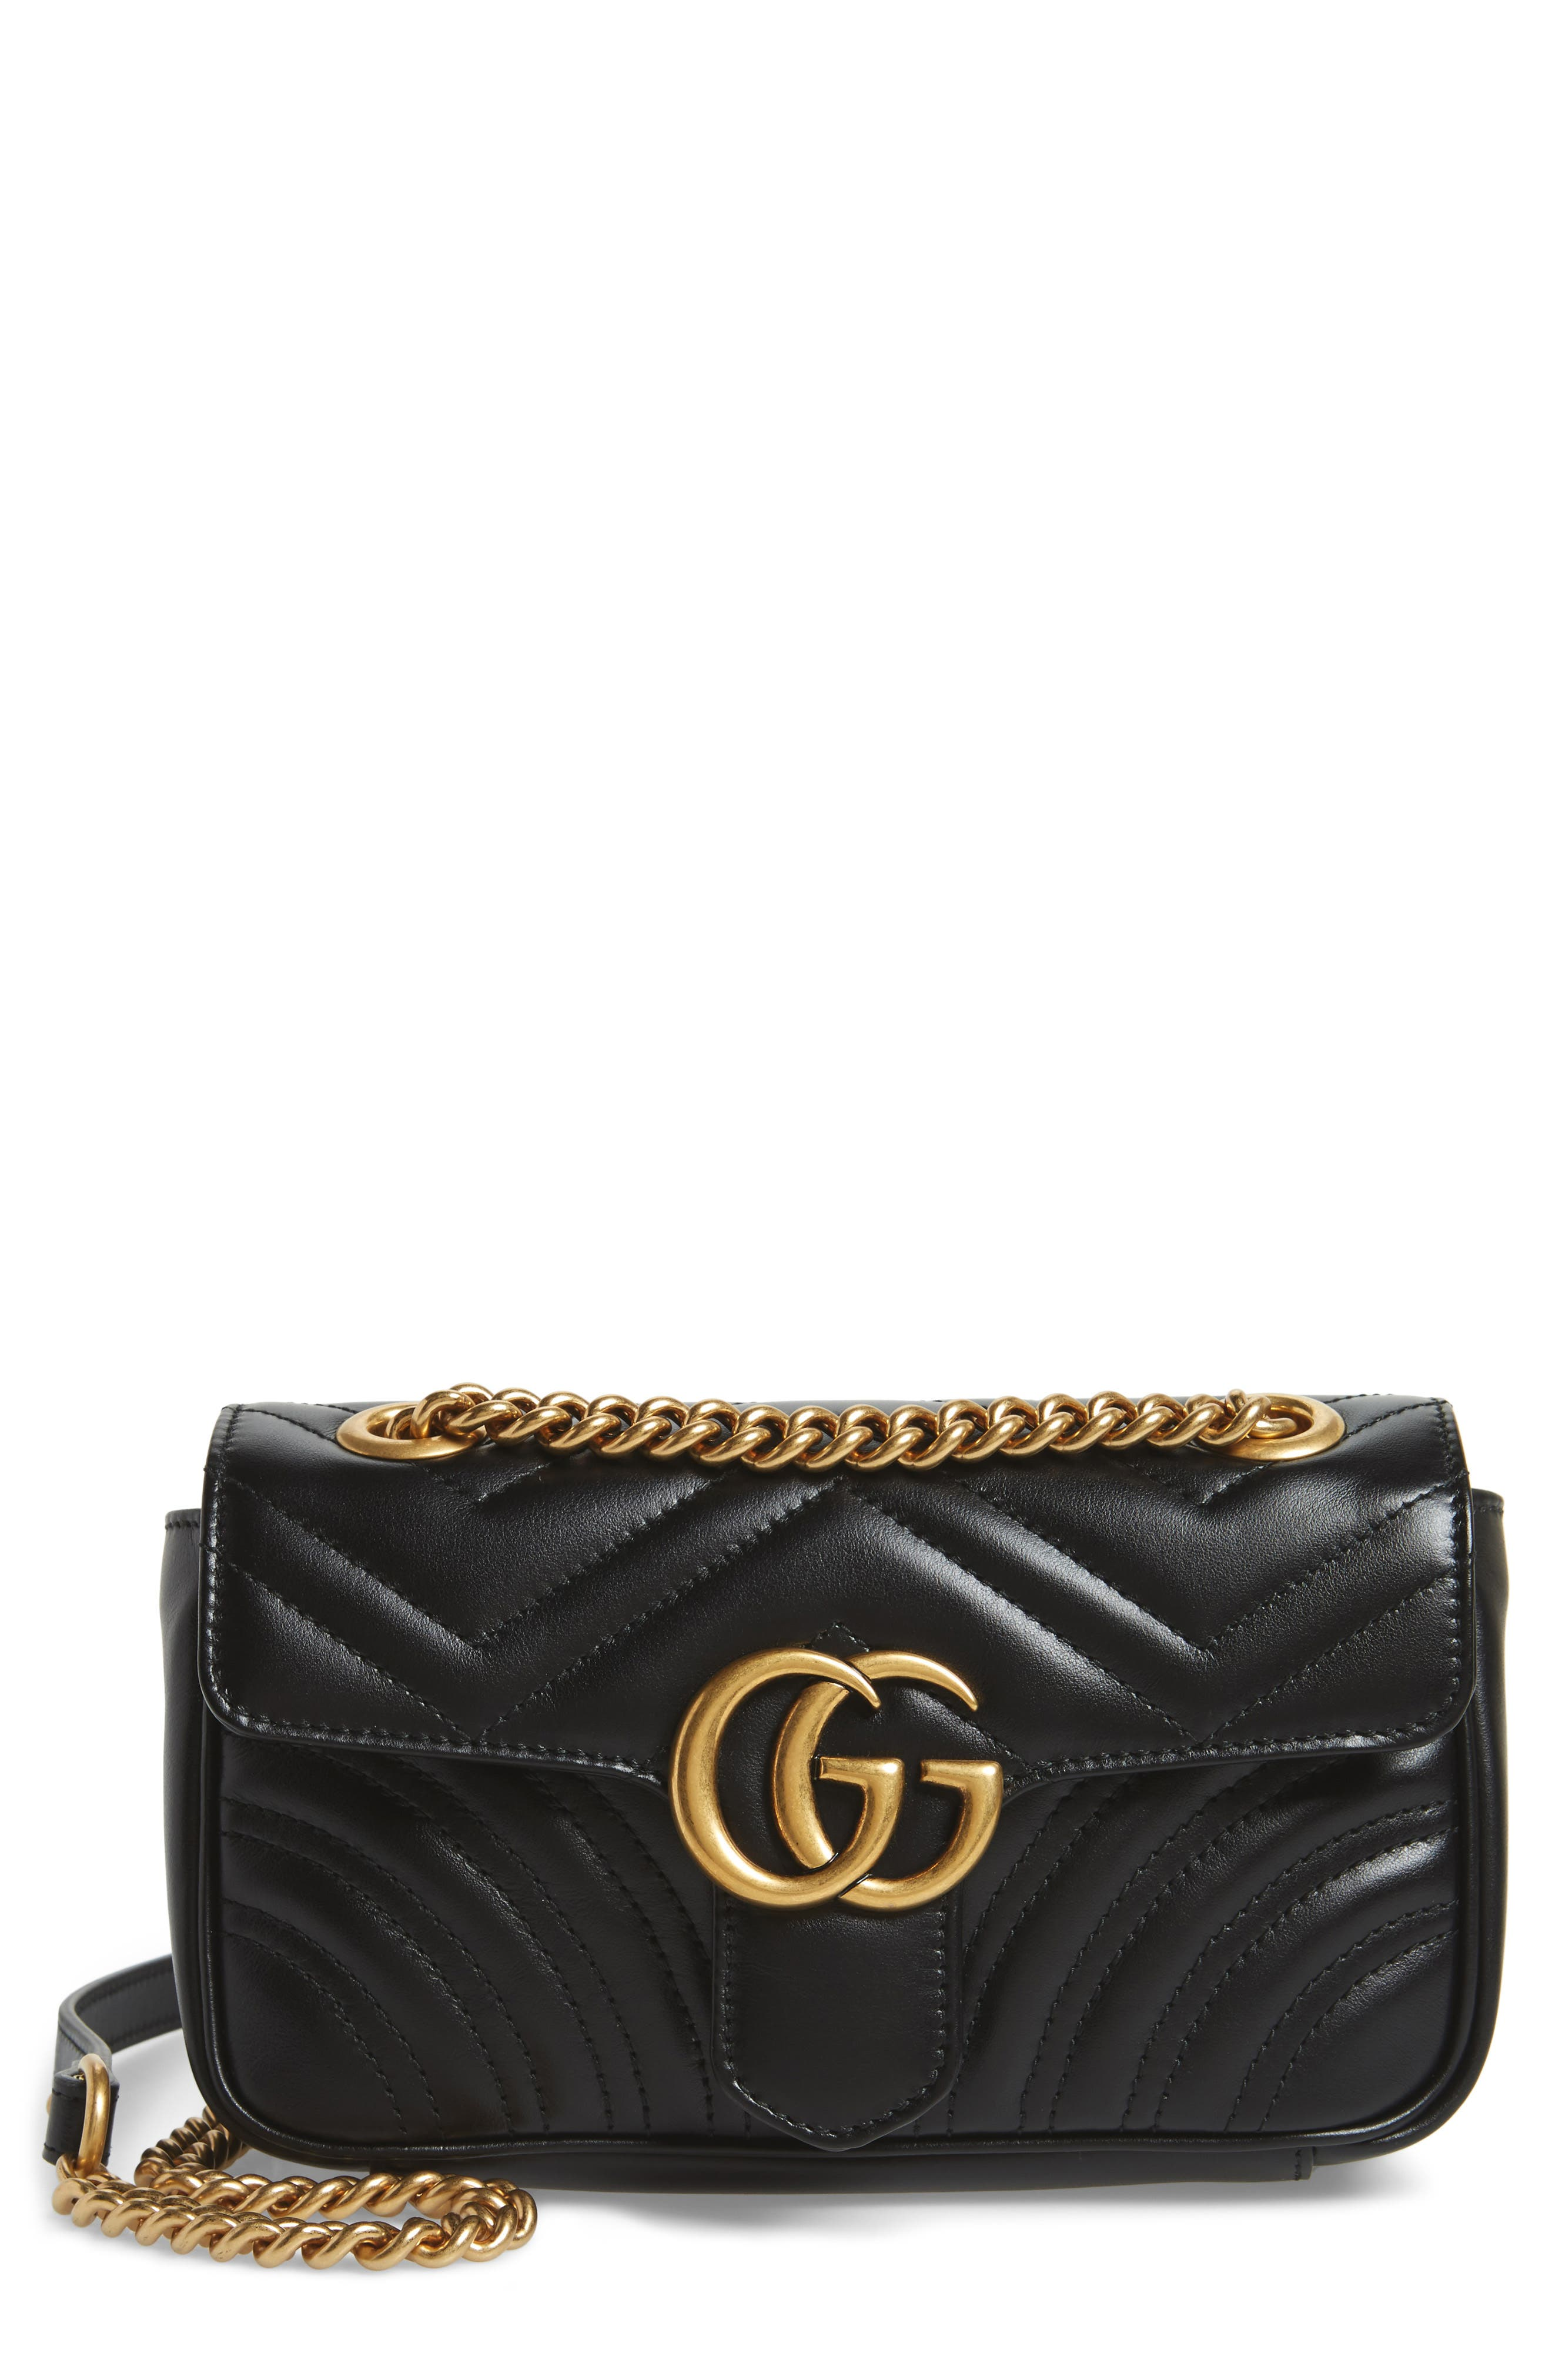 Mini GG Marmont 2.0 Matelassé Leather Shoulder Bag,                             Main thumbnail 1, color,                             NERO